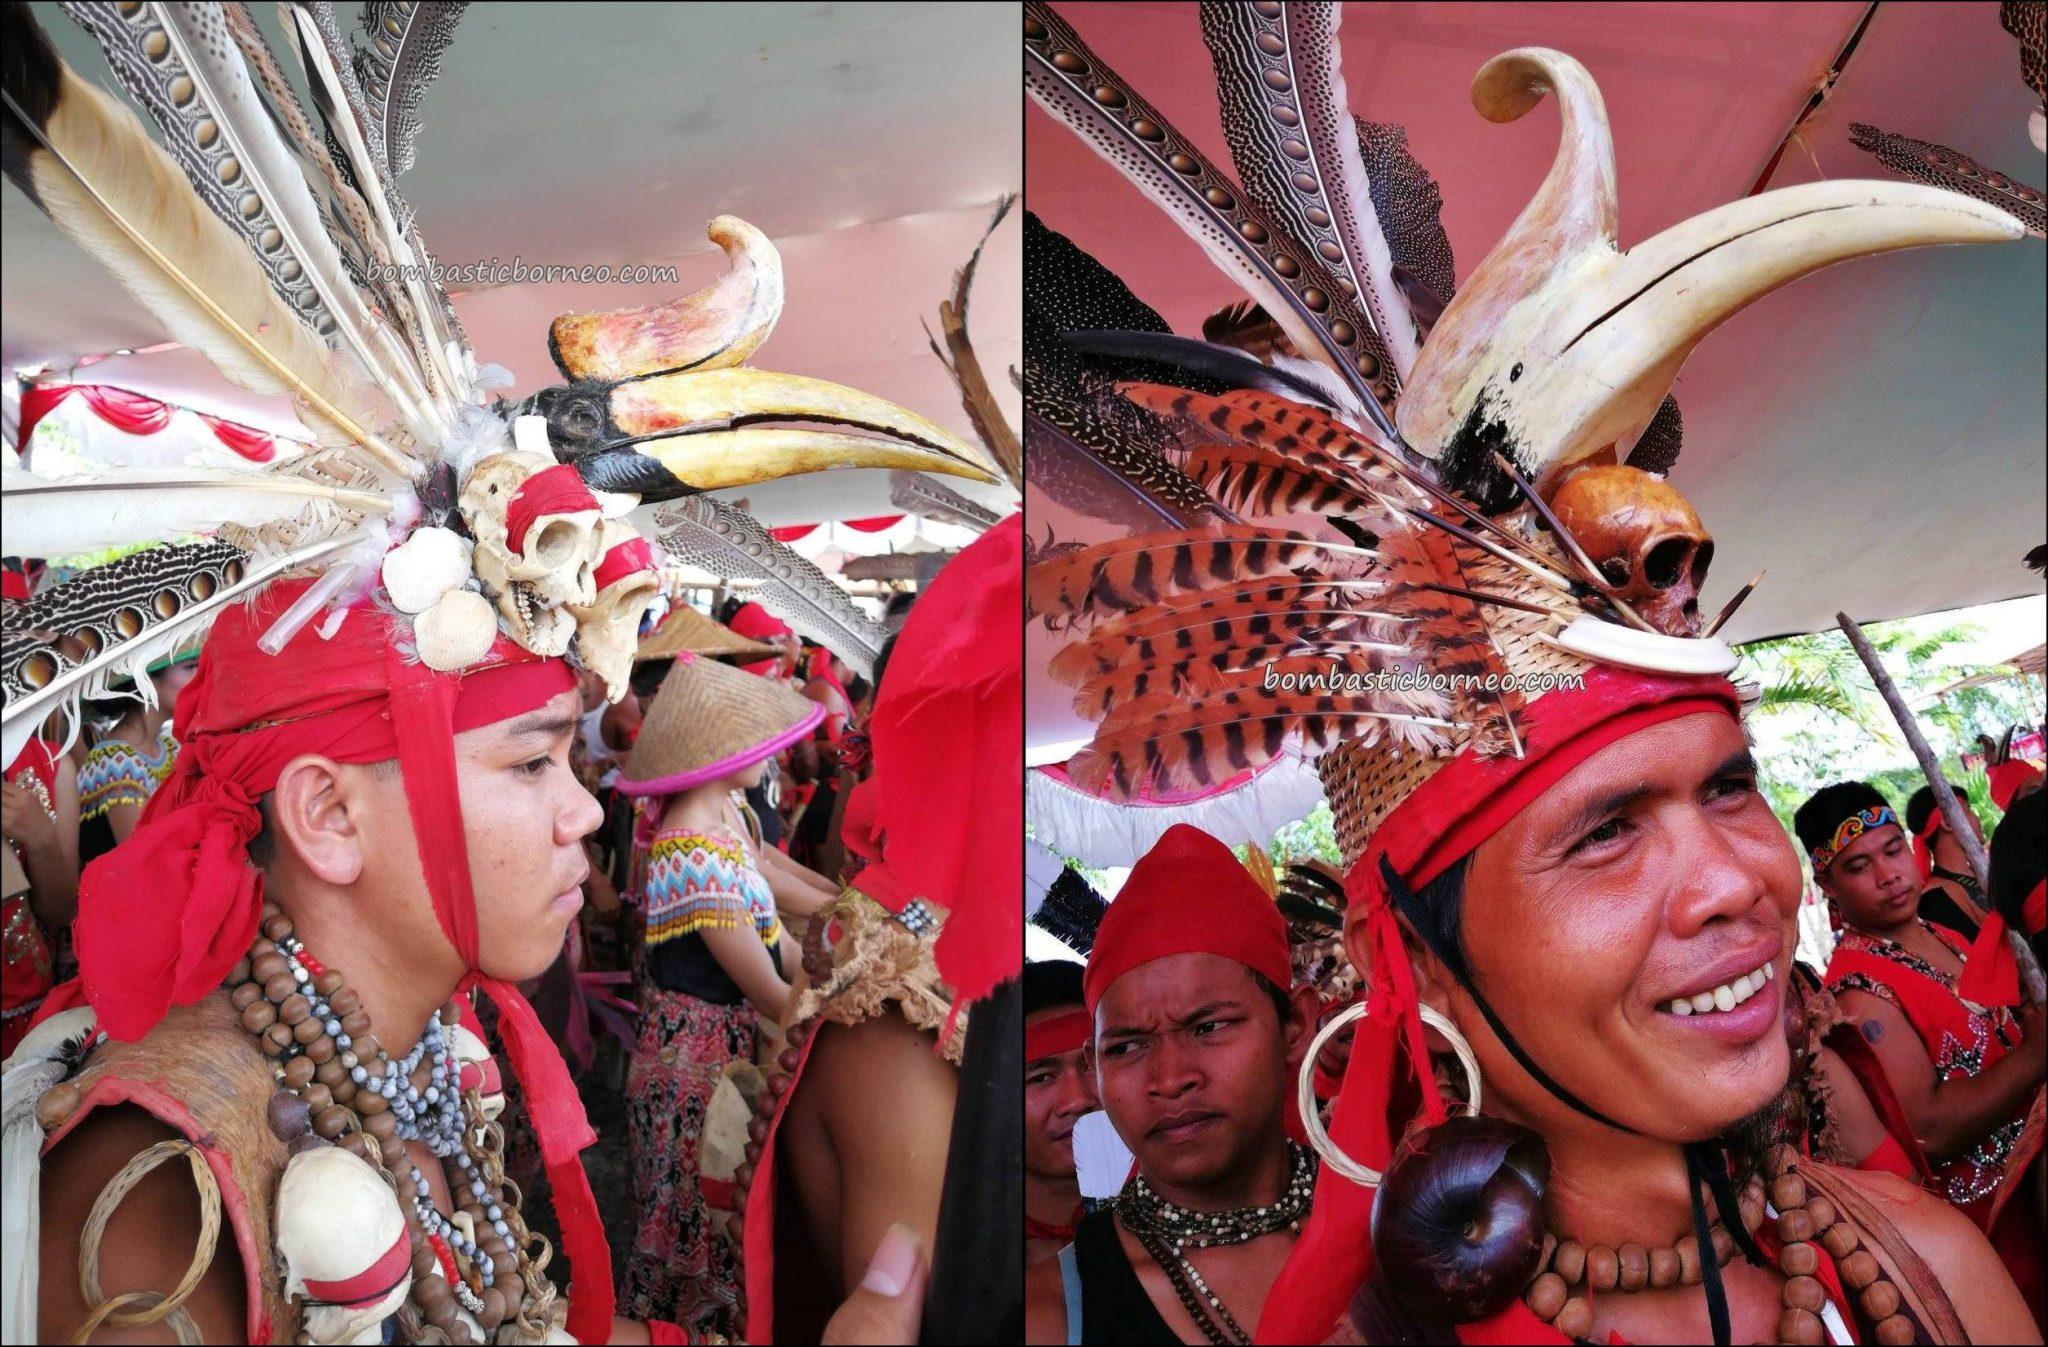 Gawai Dayak Sanggau, paddy harvest festival, thanksgiving, traditional, indigenous, event, culture, Borneo, Indonesia, Kalimantan Barat, native, tribe, wisata budaya, Tourism, travel guide, cross border